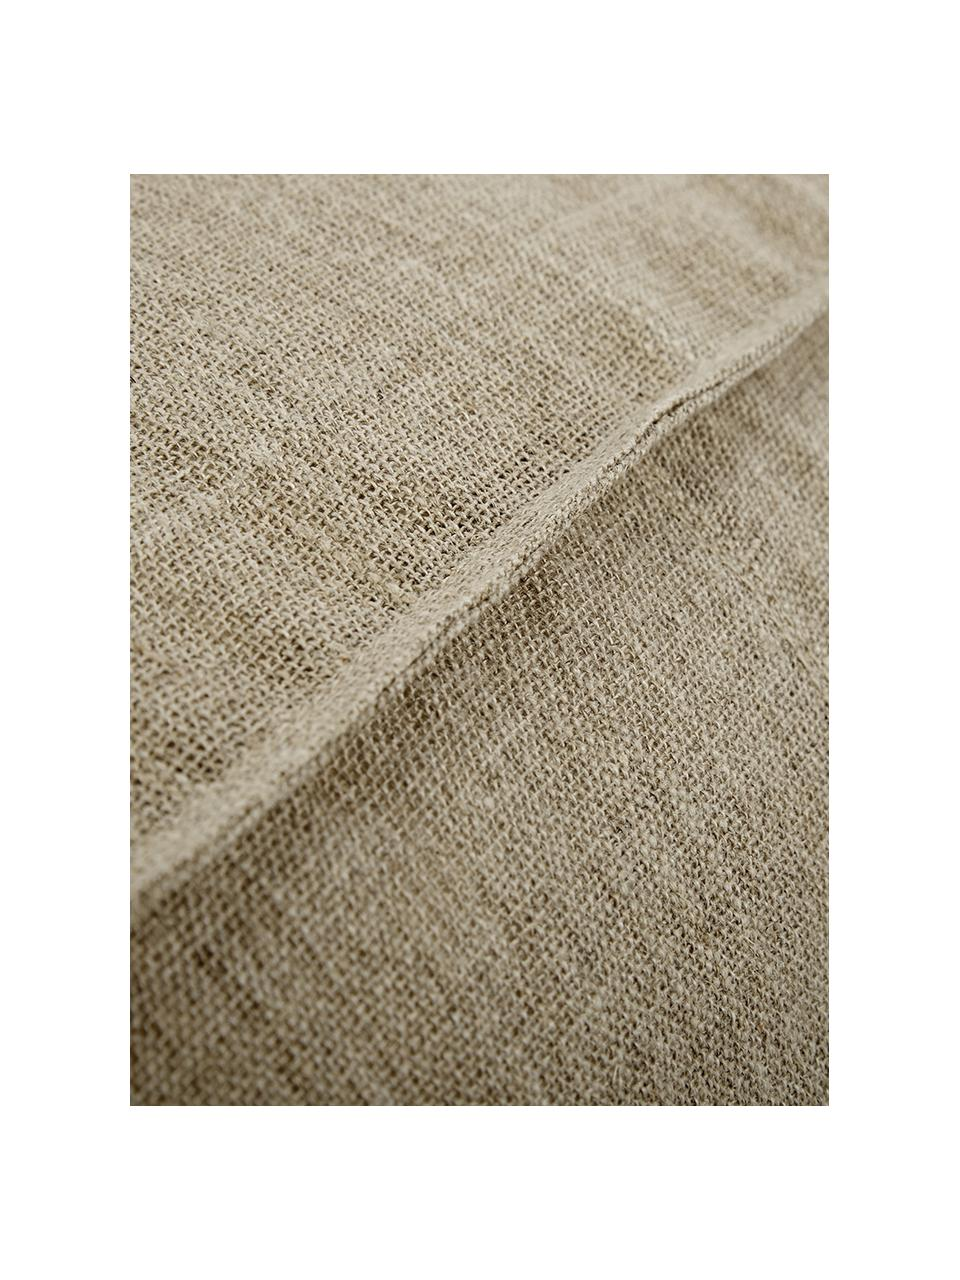 Handgemaakt vloerkussen Saffron, Bekleding: 100% linnen, Onderzijde: katoen, Taupe, 50 x 25 cm